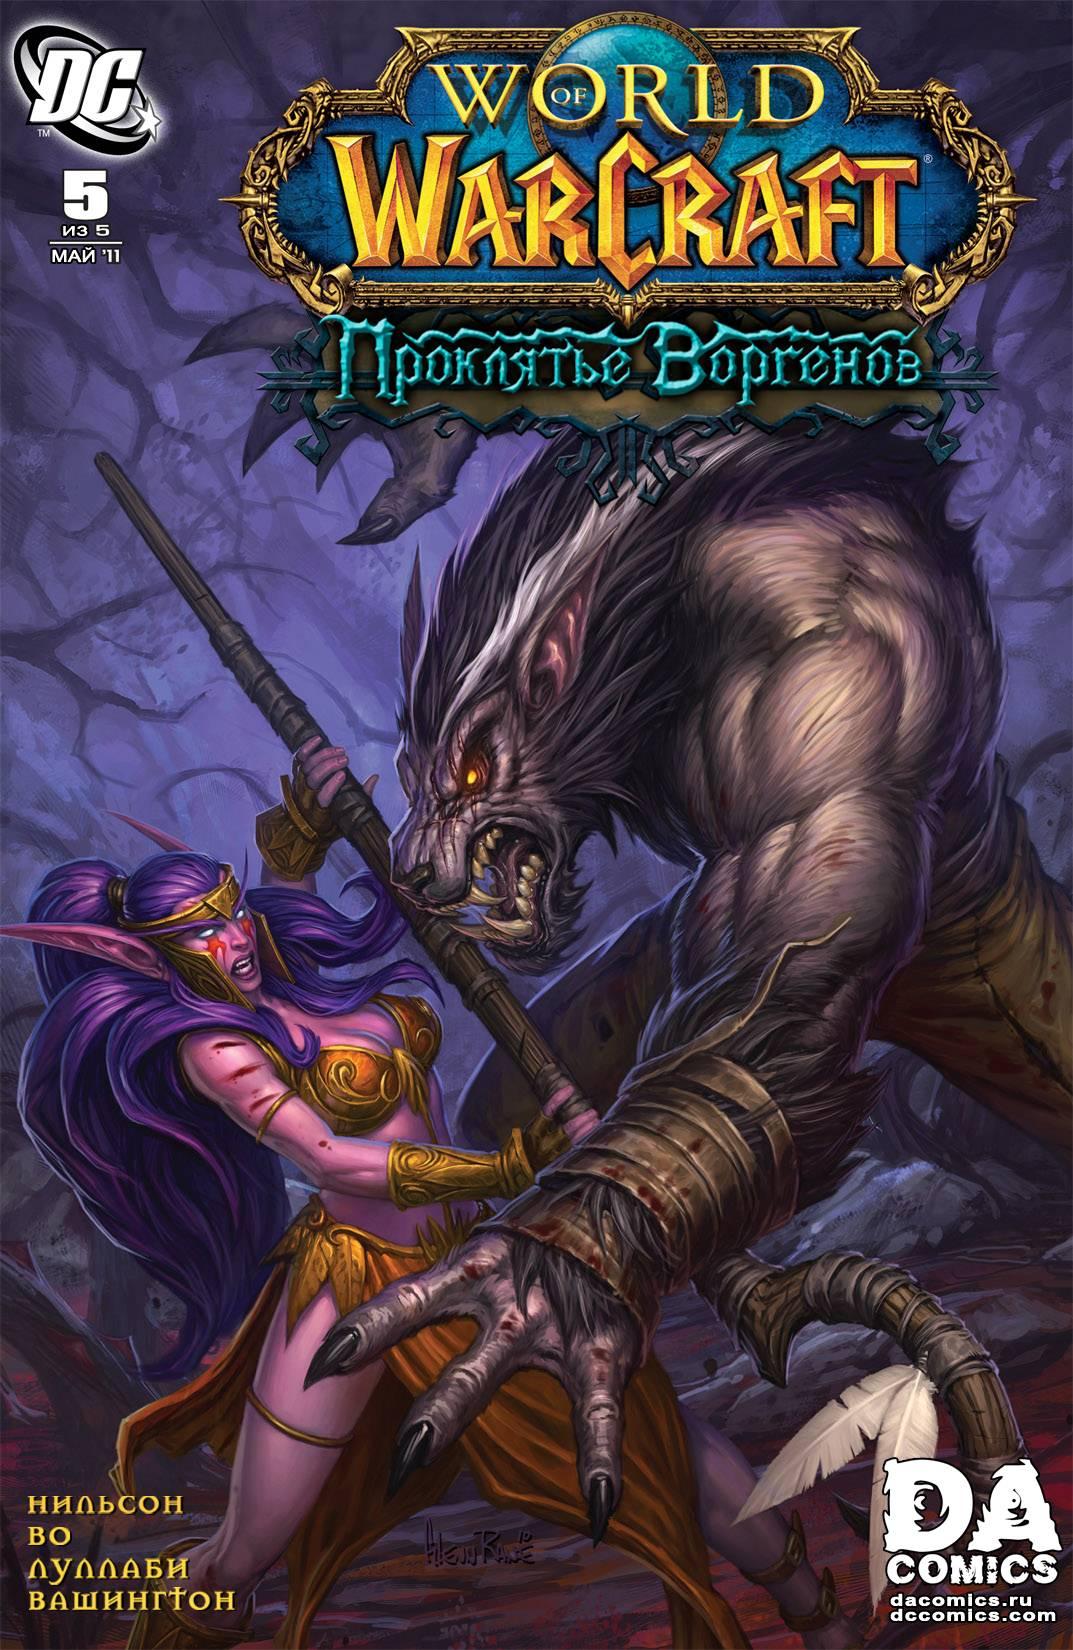 World of Warcraft: Проклятье Воргенов №5 онлайн